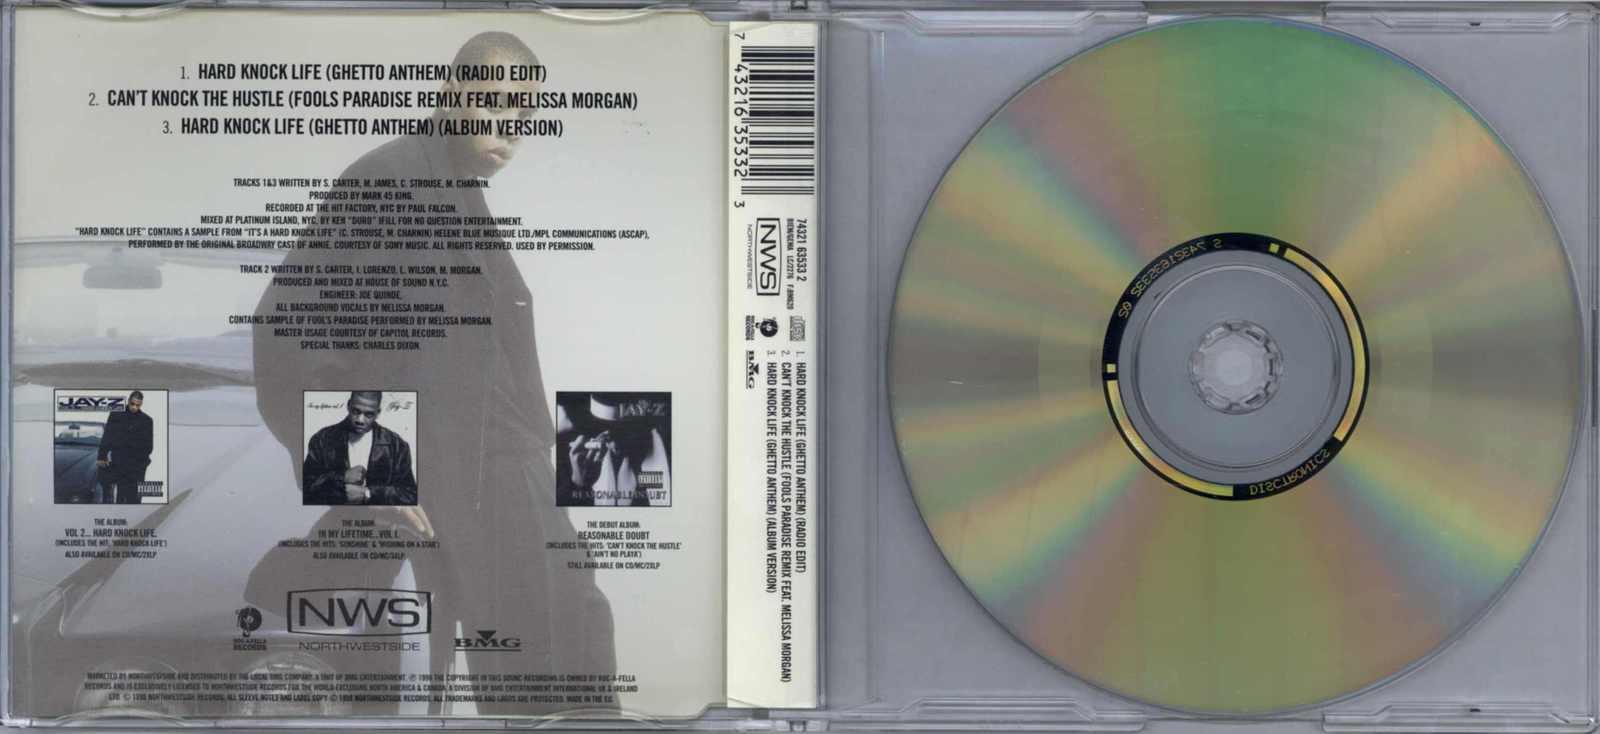 JAY-Z - HARD KNOCK LIFE (GHETTO ANTHEM) 1998 EU CD SINGLE NORTHWESTSIDE RECORDS